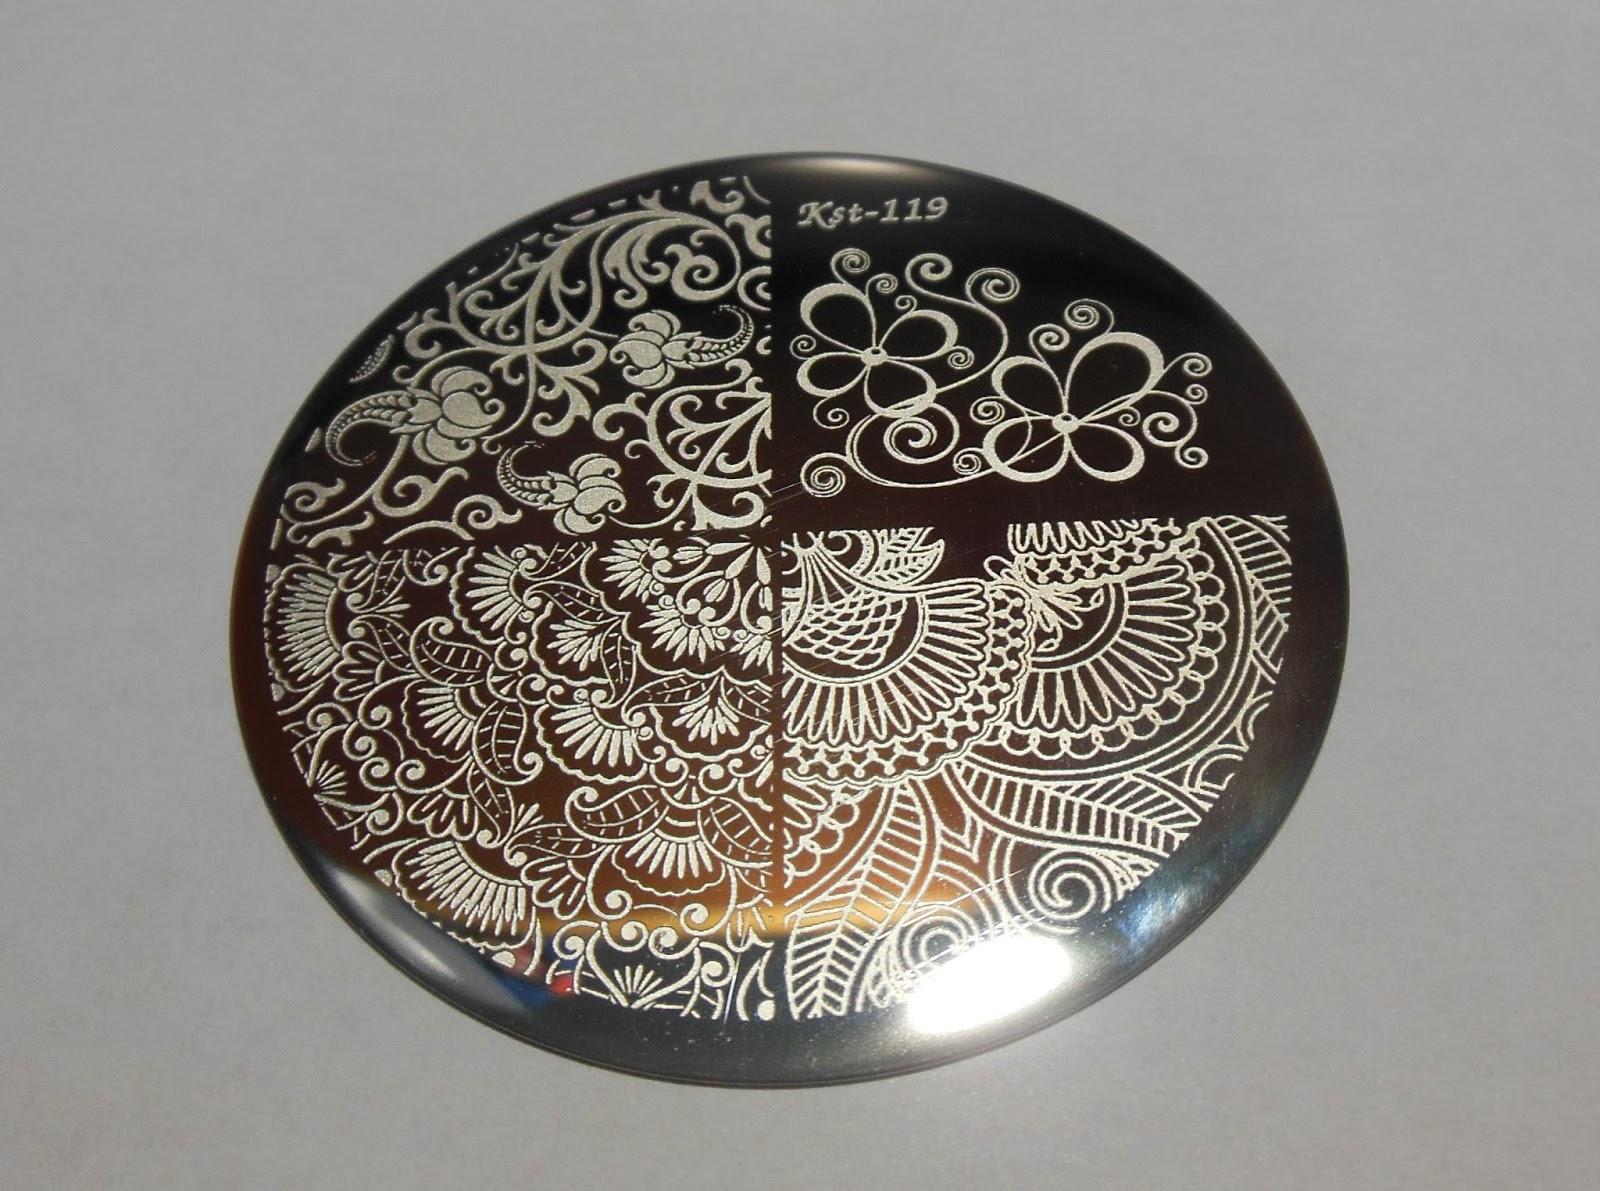 El Corazon диск для стемпинга № EC-s 539